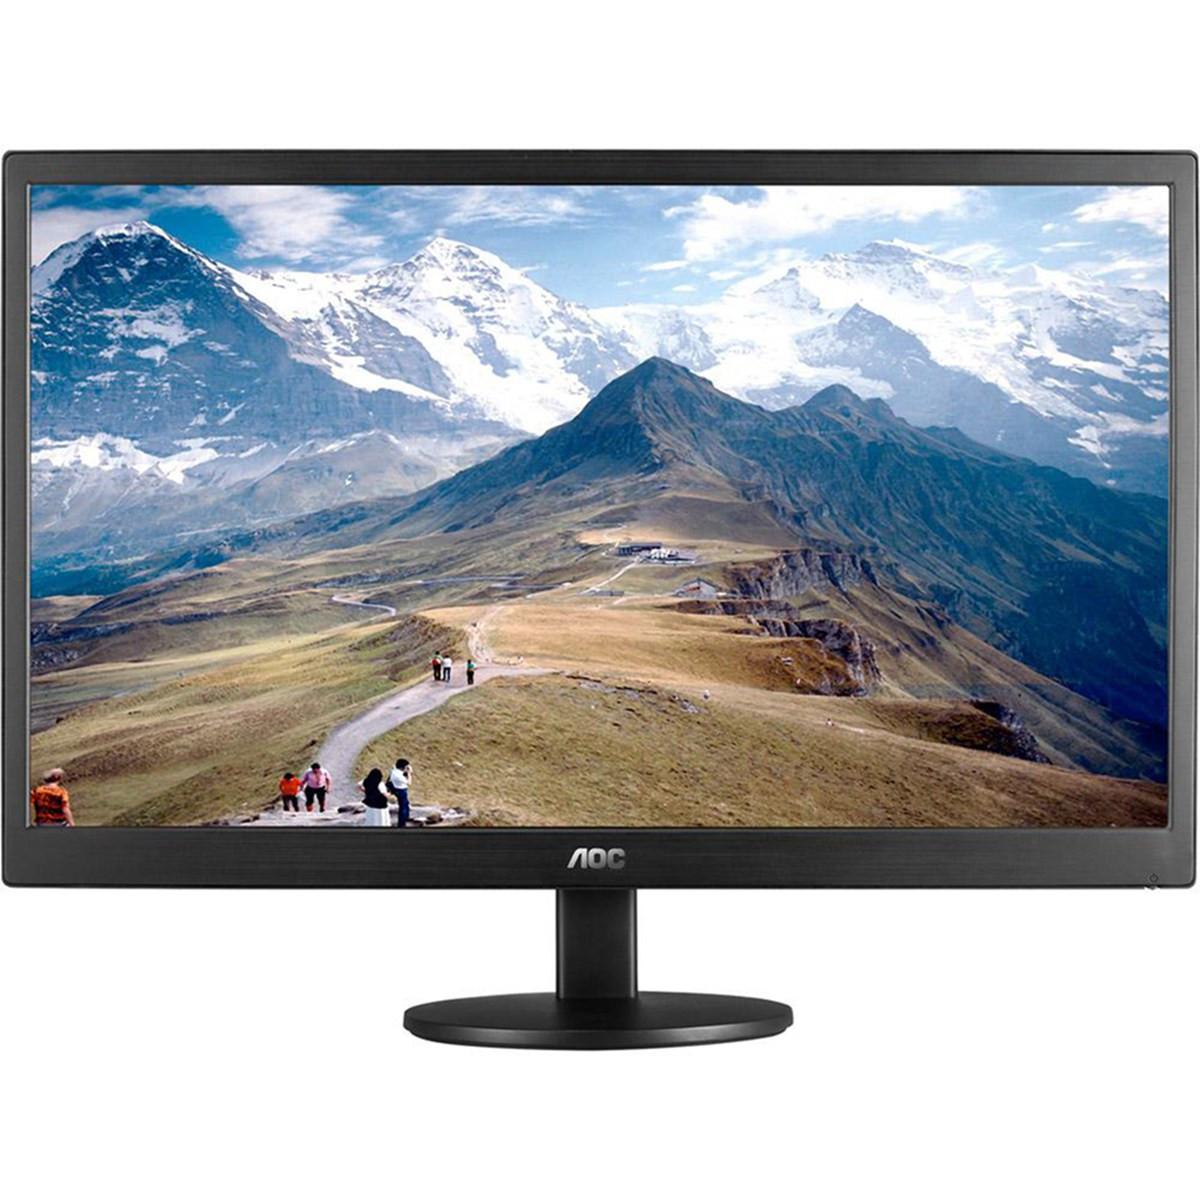 "Monitor 18,5"" LED VGA Widescreen E970SWNL 1366X768 200 CD/M² de Brilho | AOC"